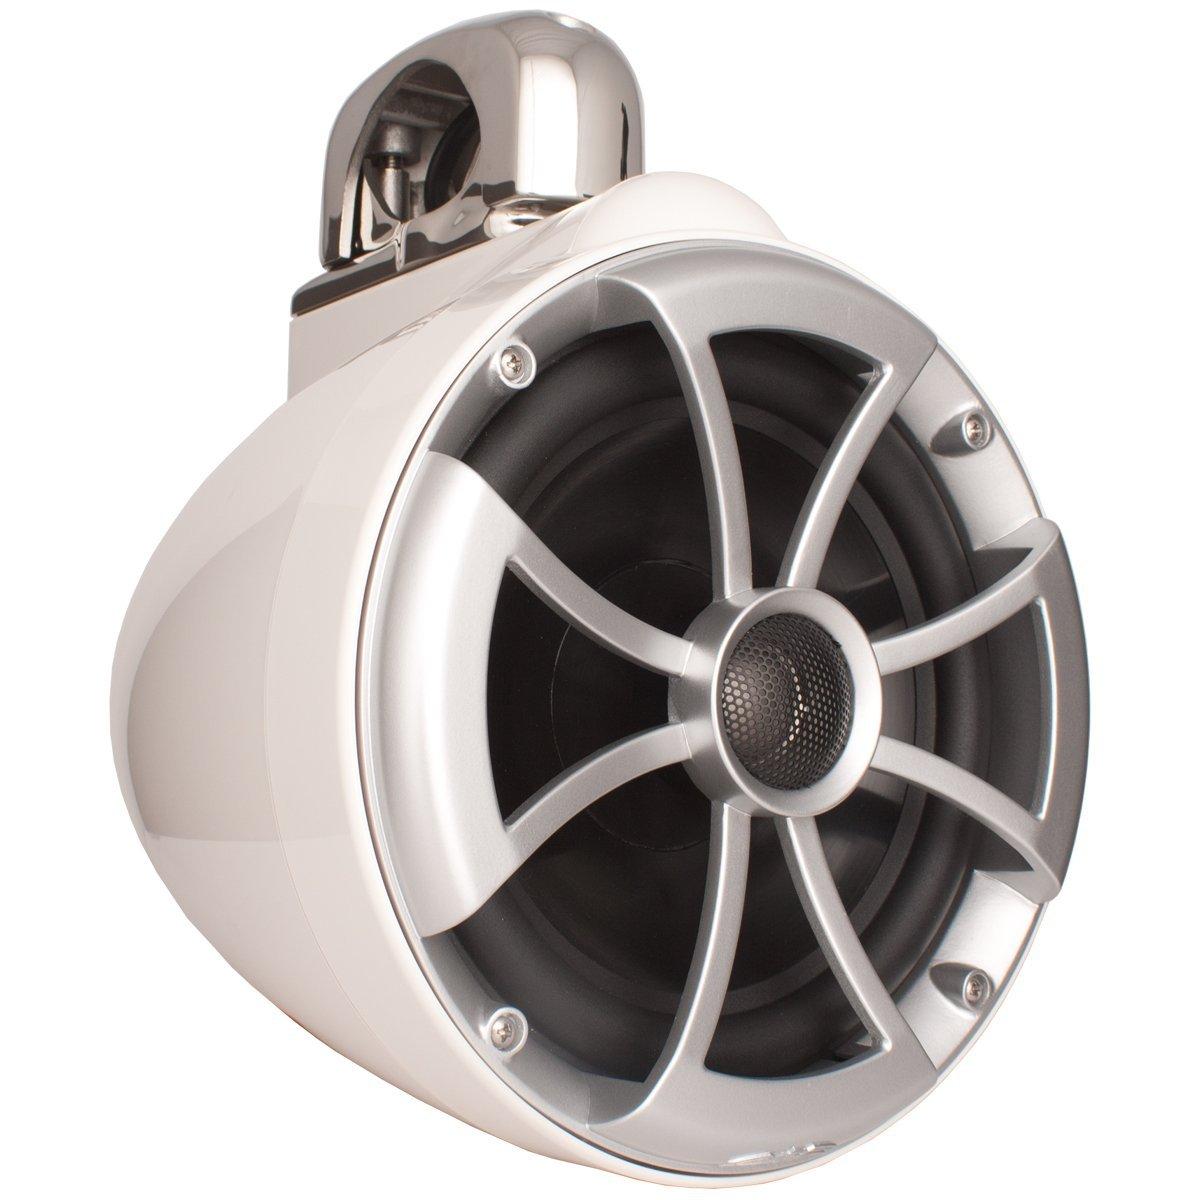 Best Wakeboard Tower Speakers for Boat | Outdoor Speaker Supply